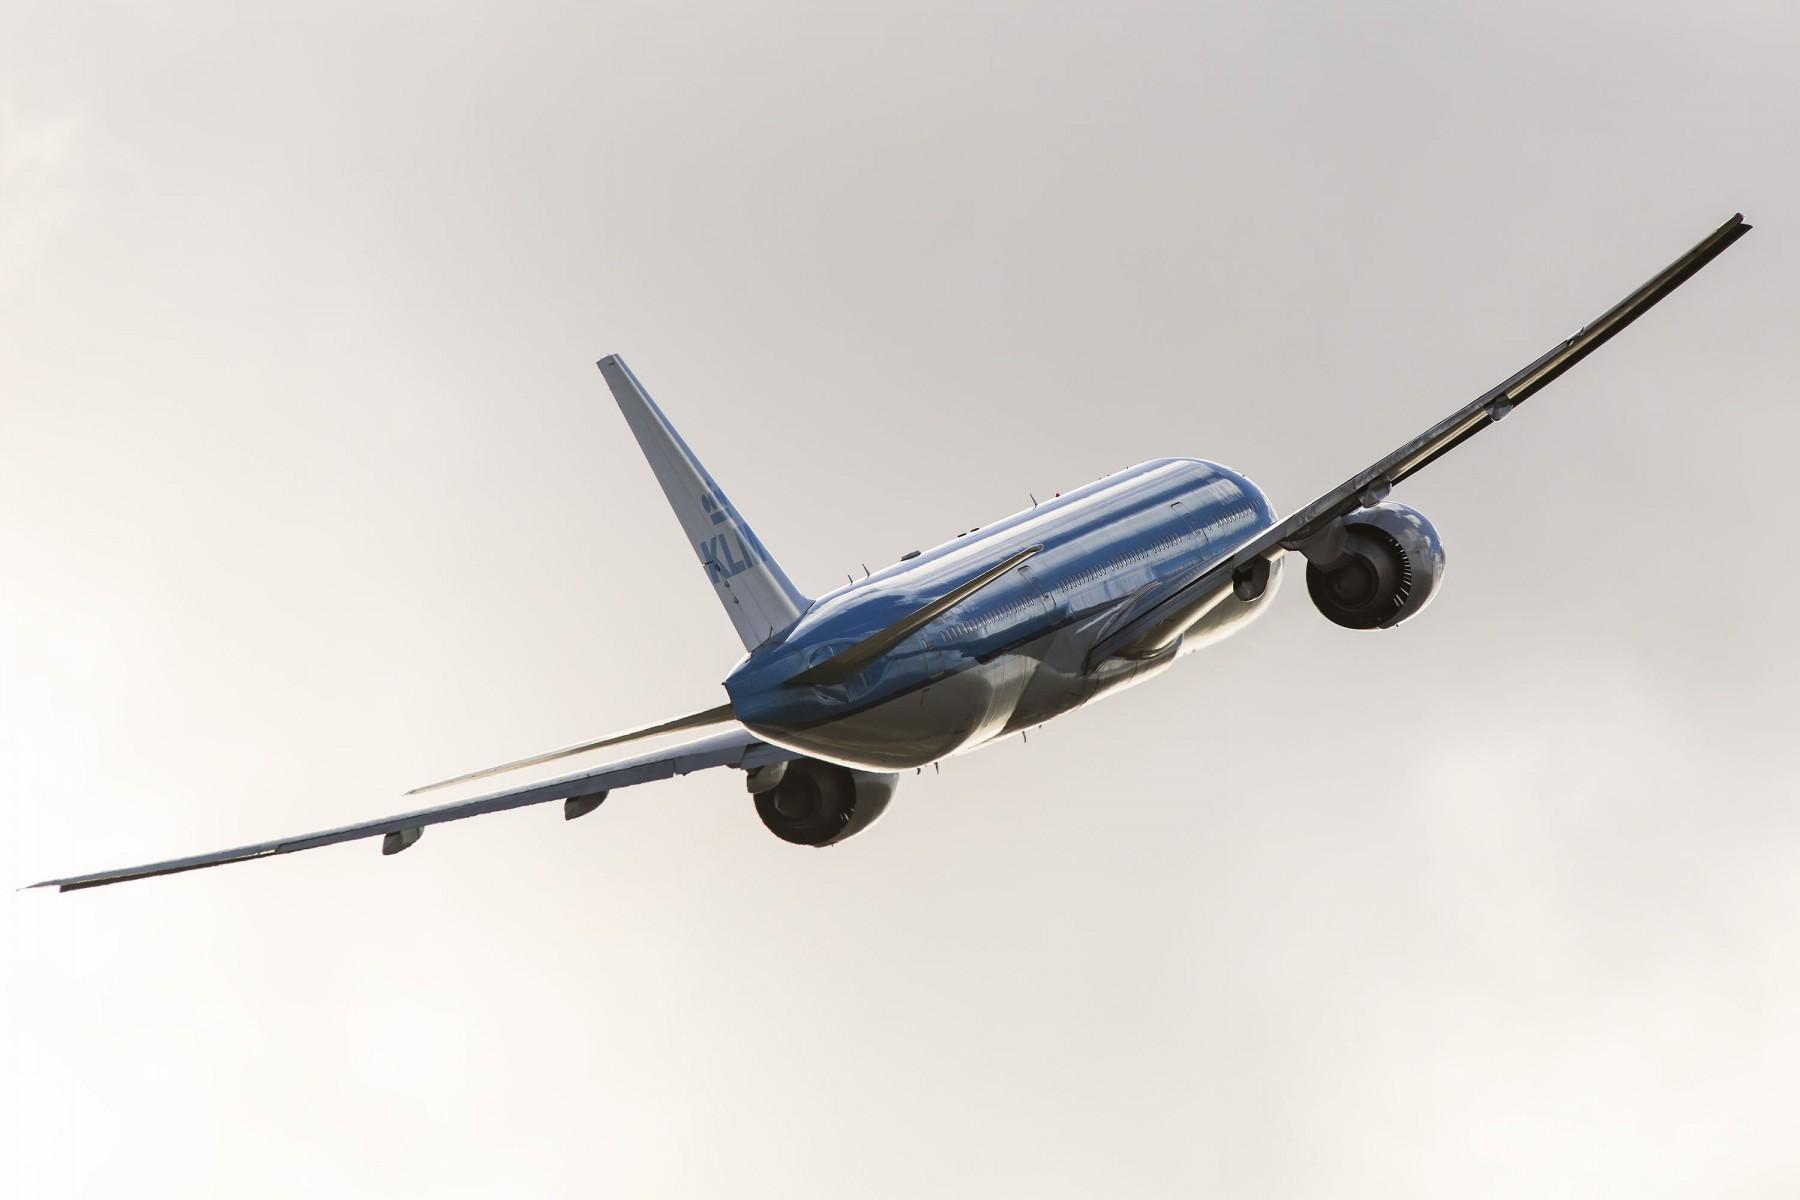 KLM to suspend flight services to Fukuoka, Japan